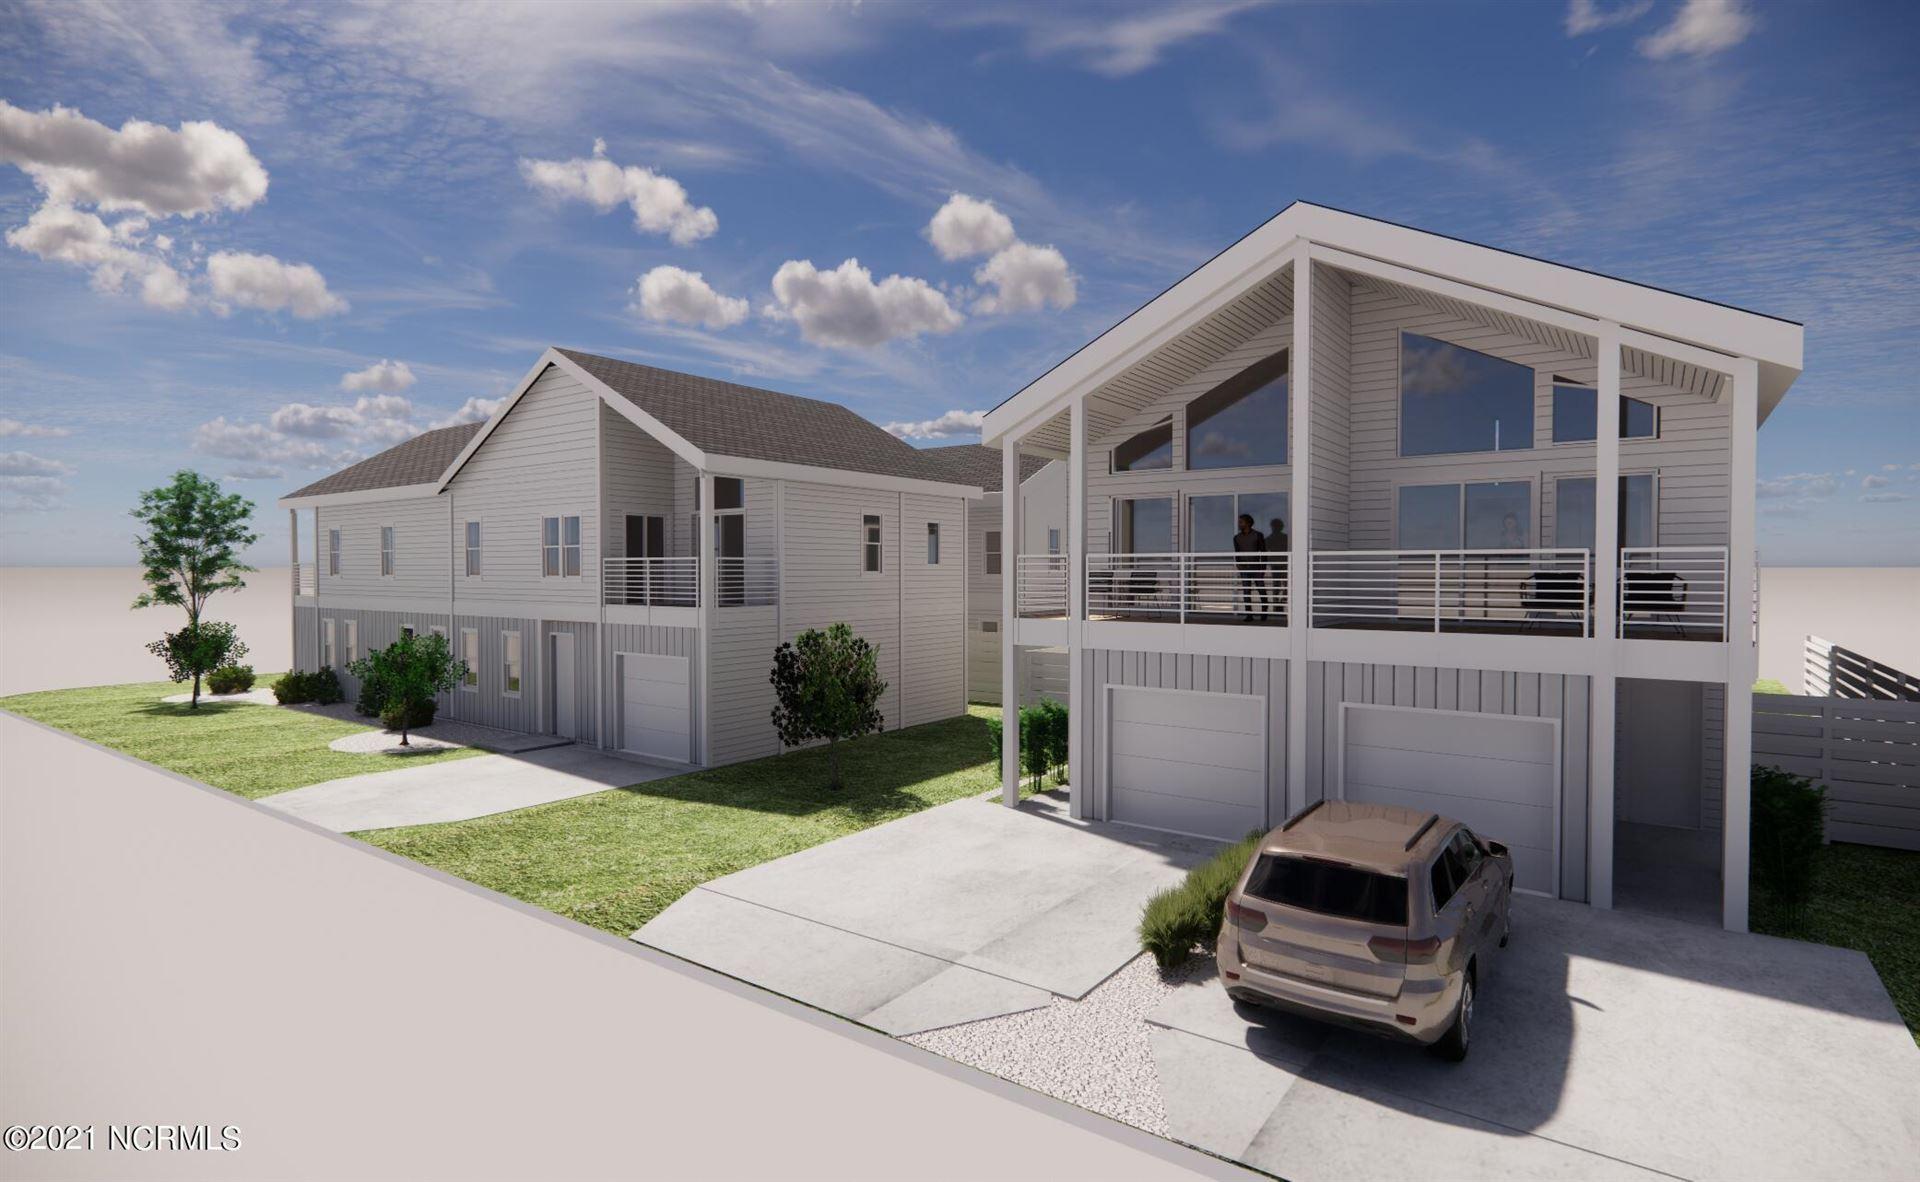 Photo of 619 Sumter Avenue #Unit 2, Carolina Beach, NC 28428 (MLS # 100290932)